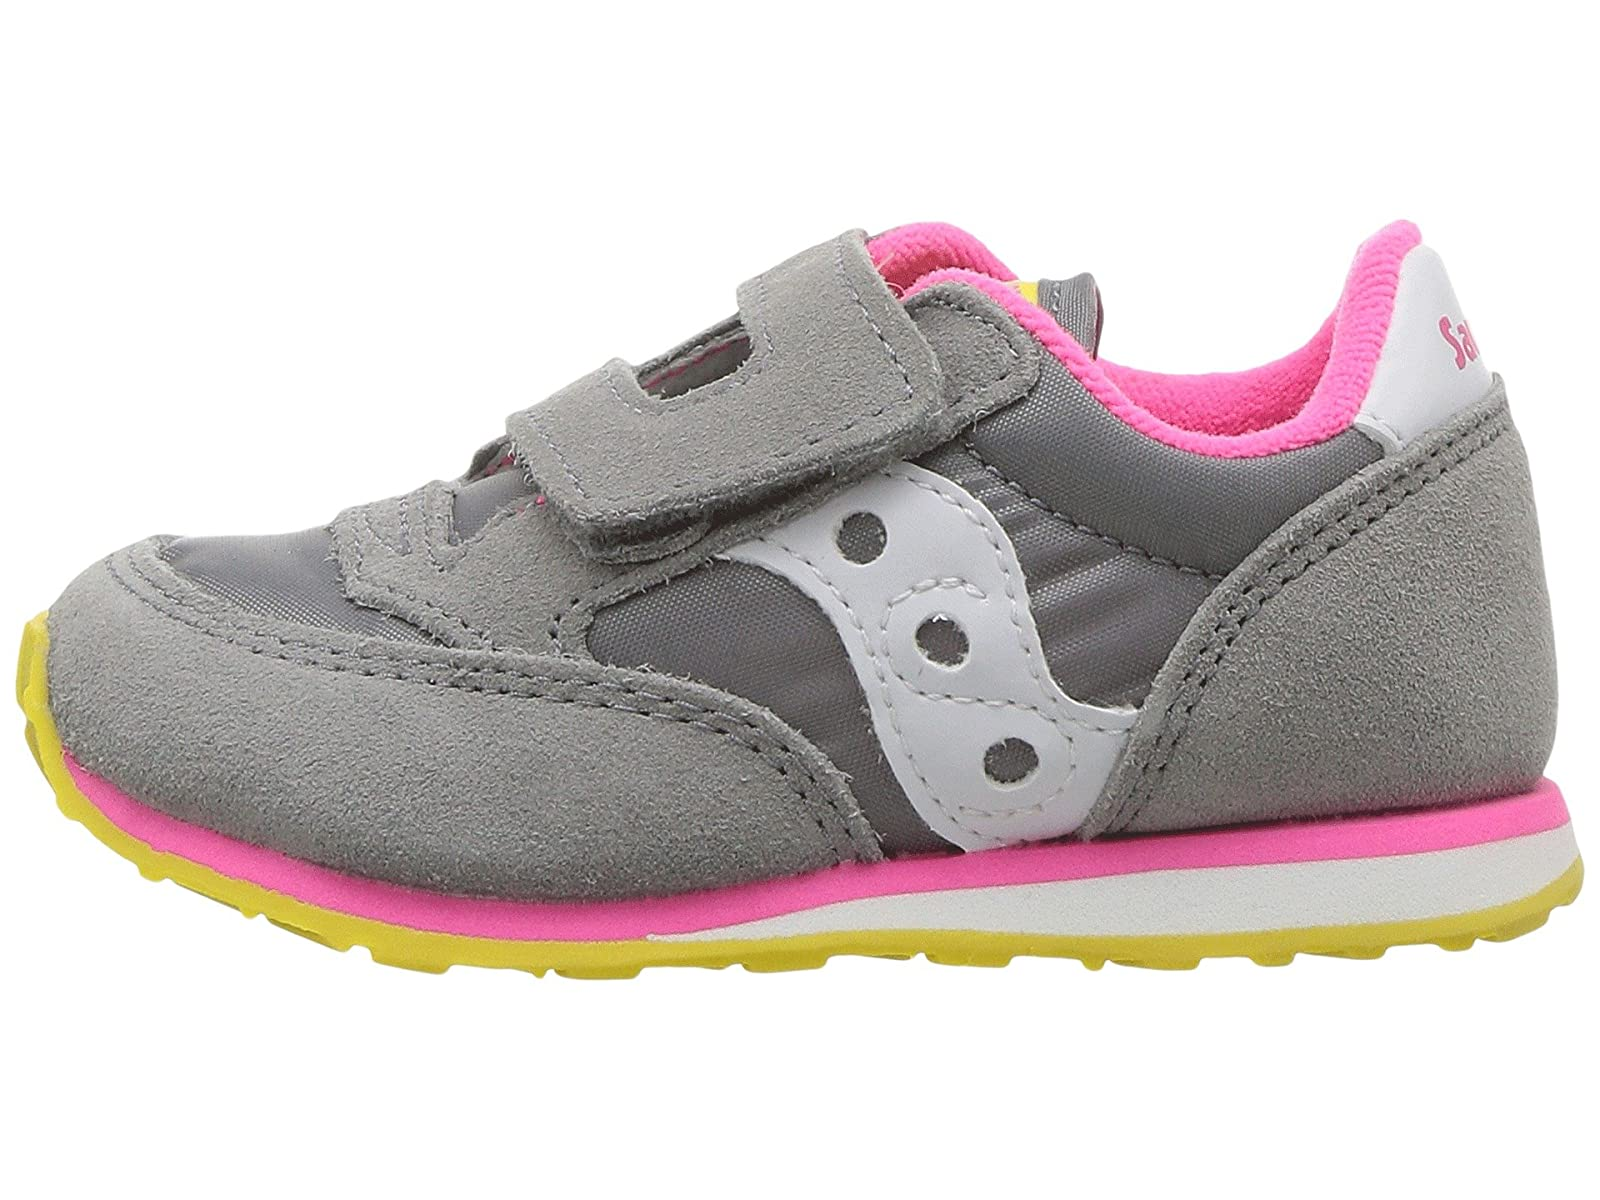 ca5ecf319d Details about Girl's Shoes Saucony Kids Originals Jazz Hook & Loop  (Toddler/Little Kid)